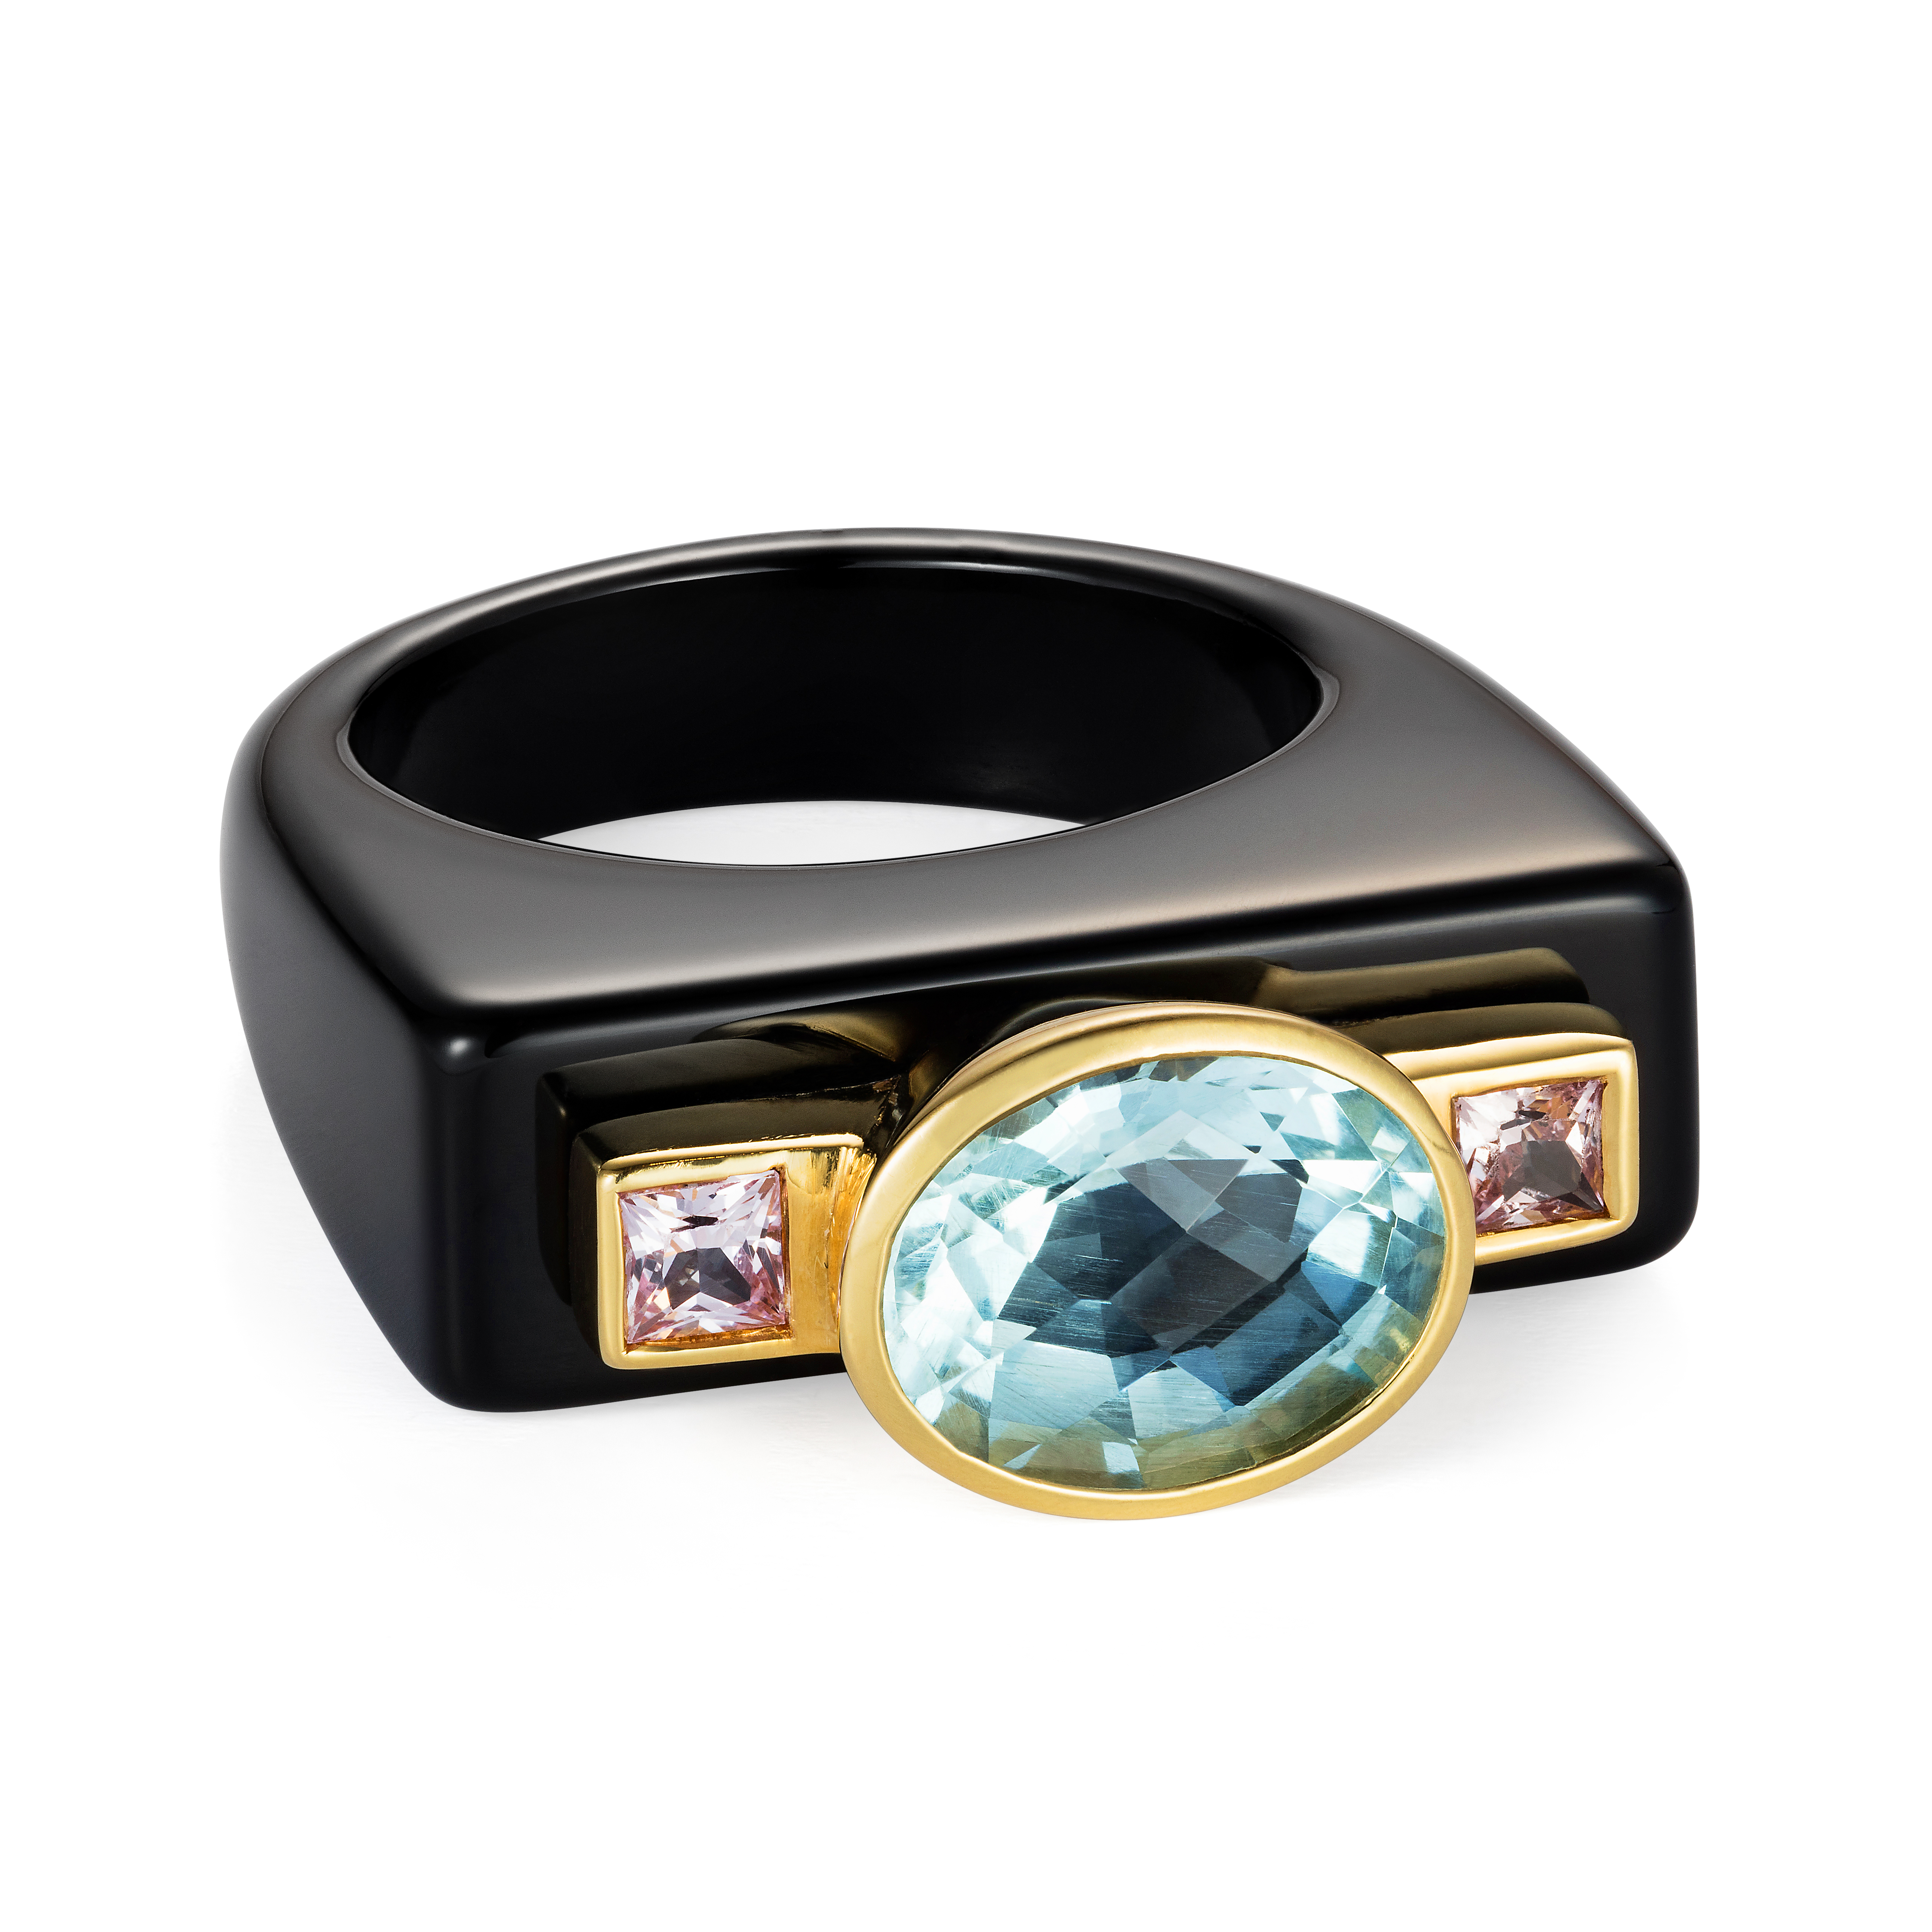 Dolce Vita Onyx Ring – Aquamarine And Princess Cut Pink Sapphires 18k Gold